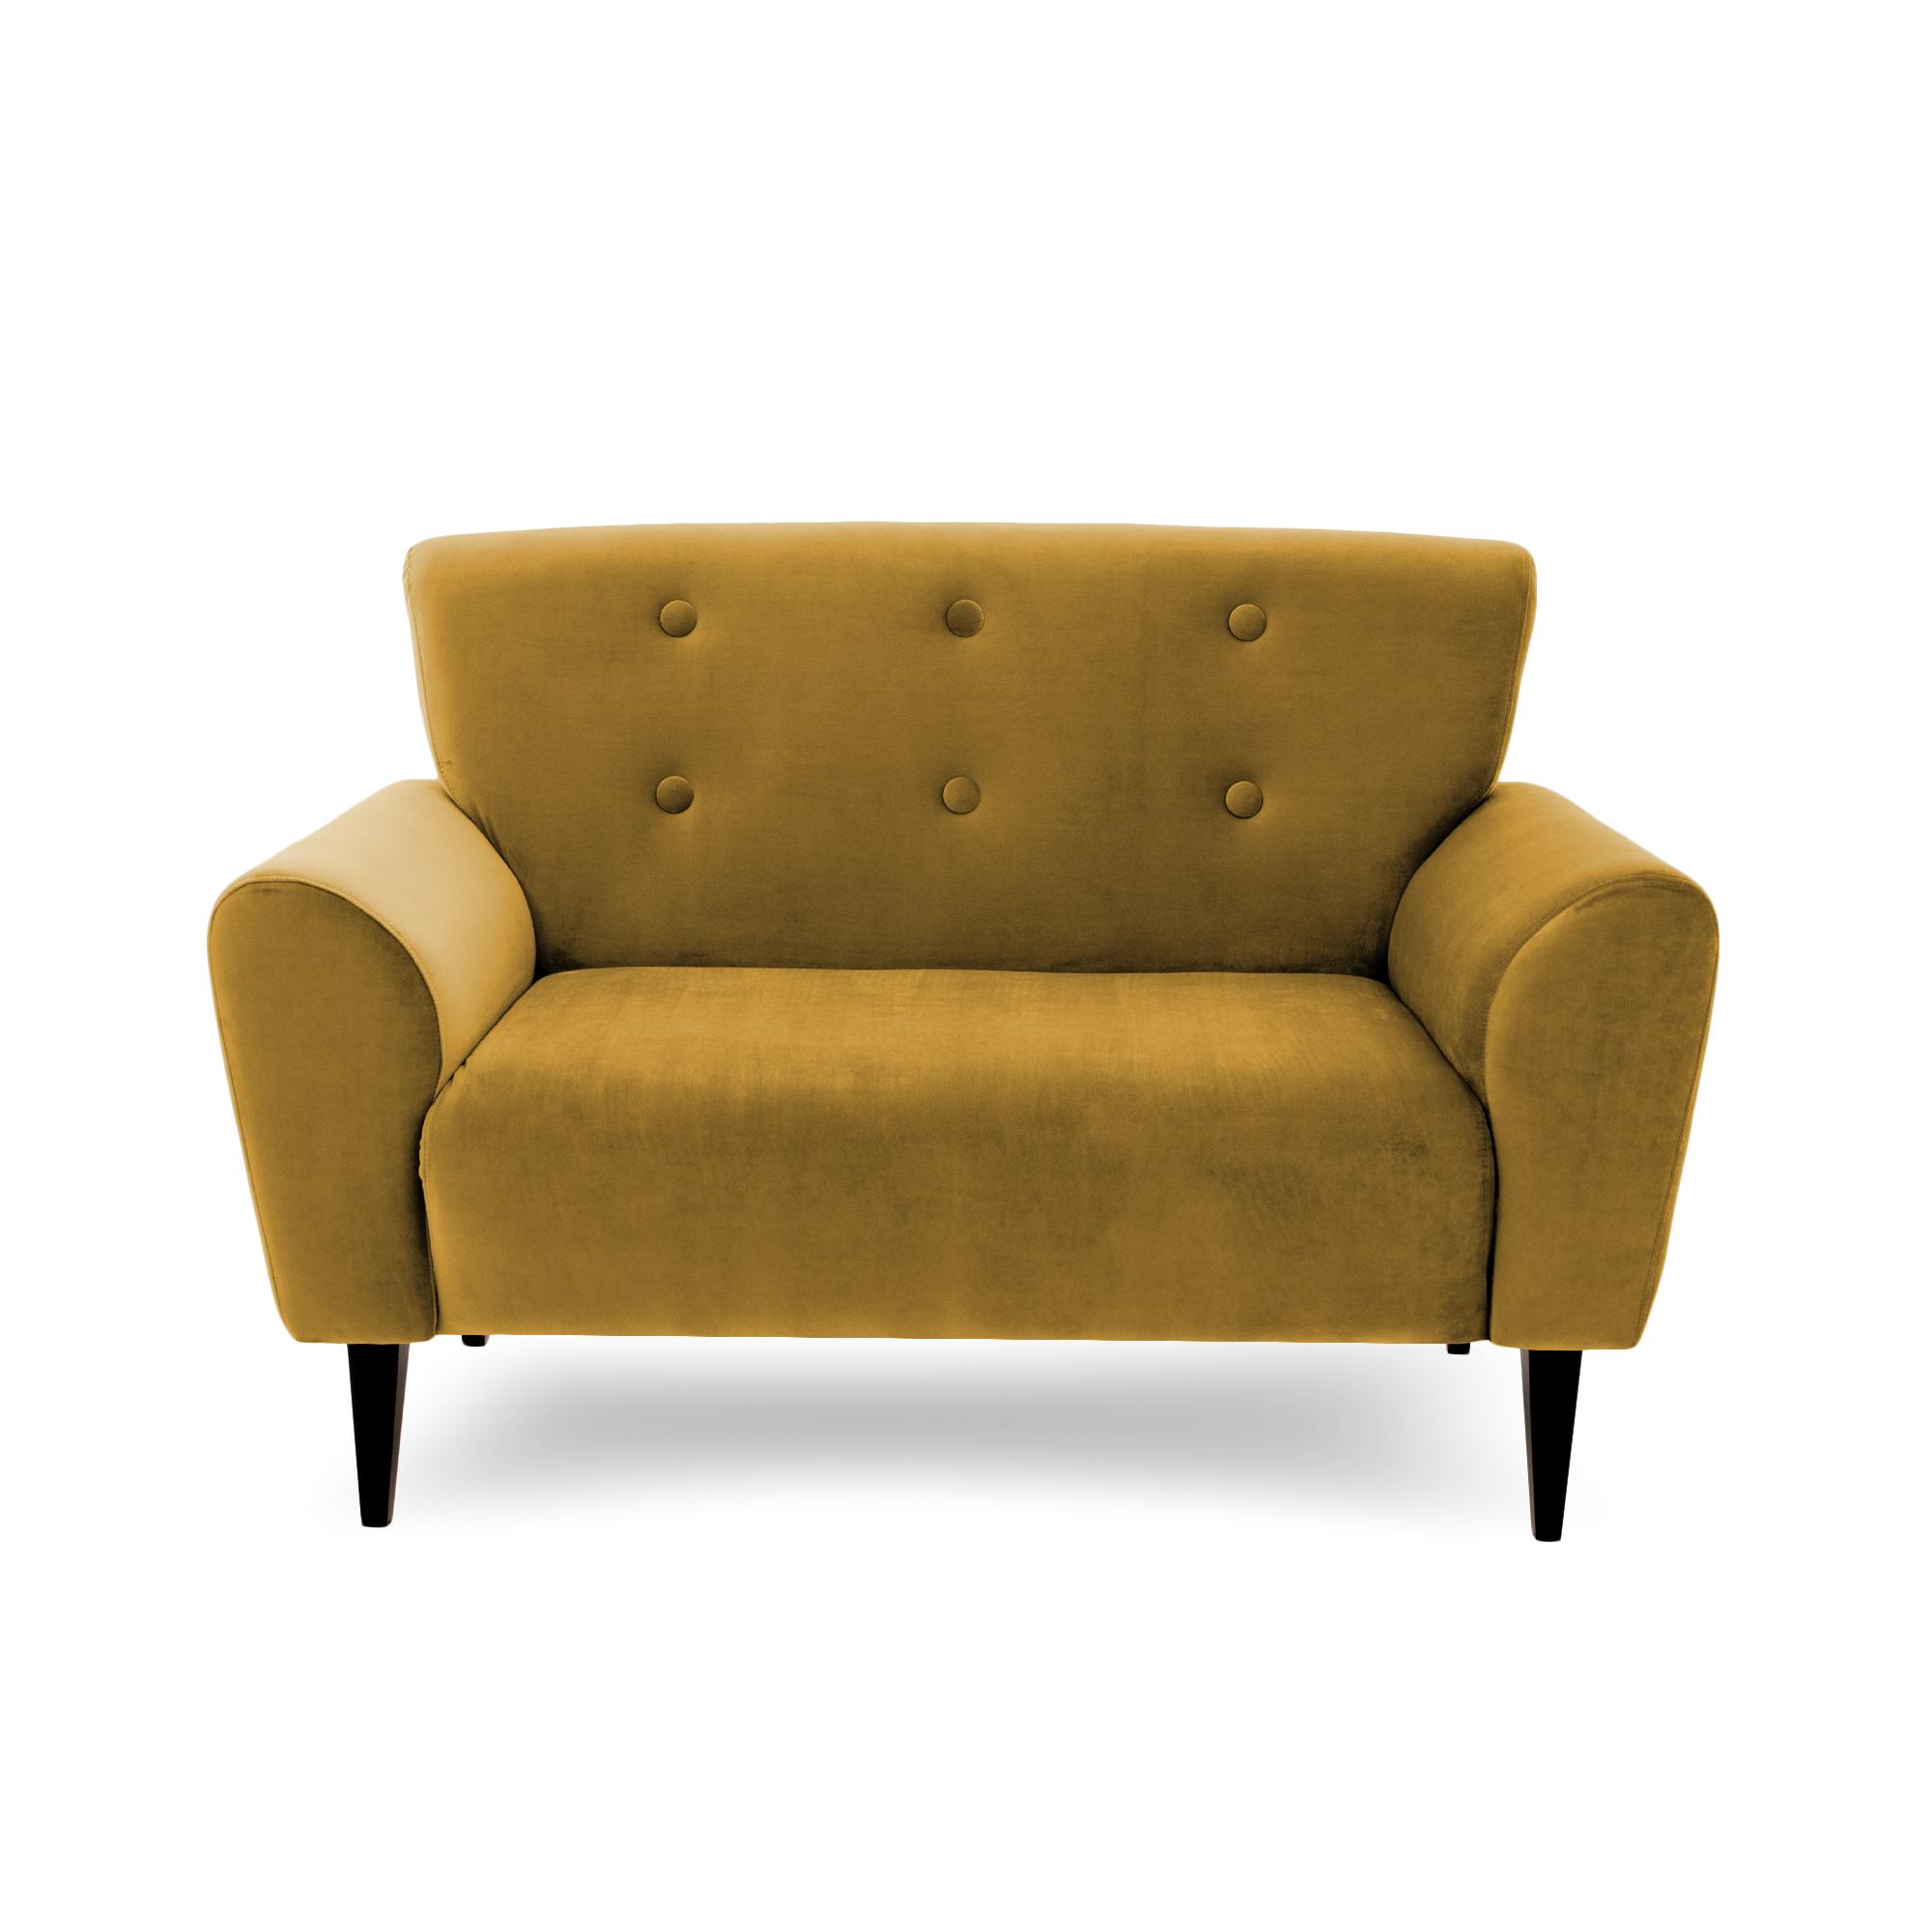 Canapea Fixa 2 locuri Kiara Mustard